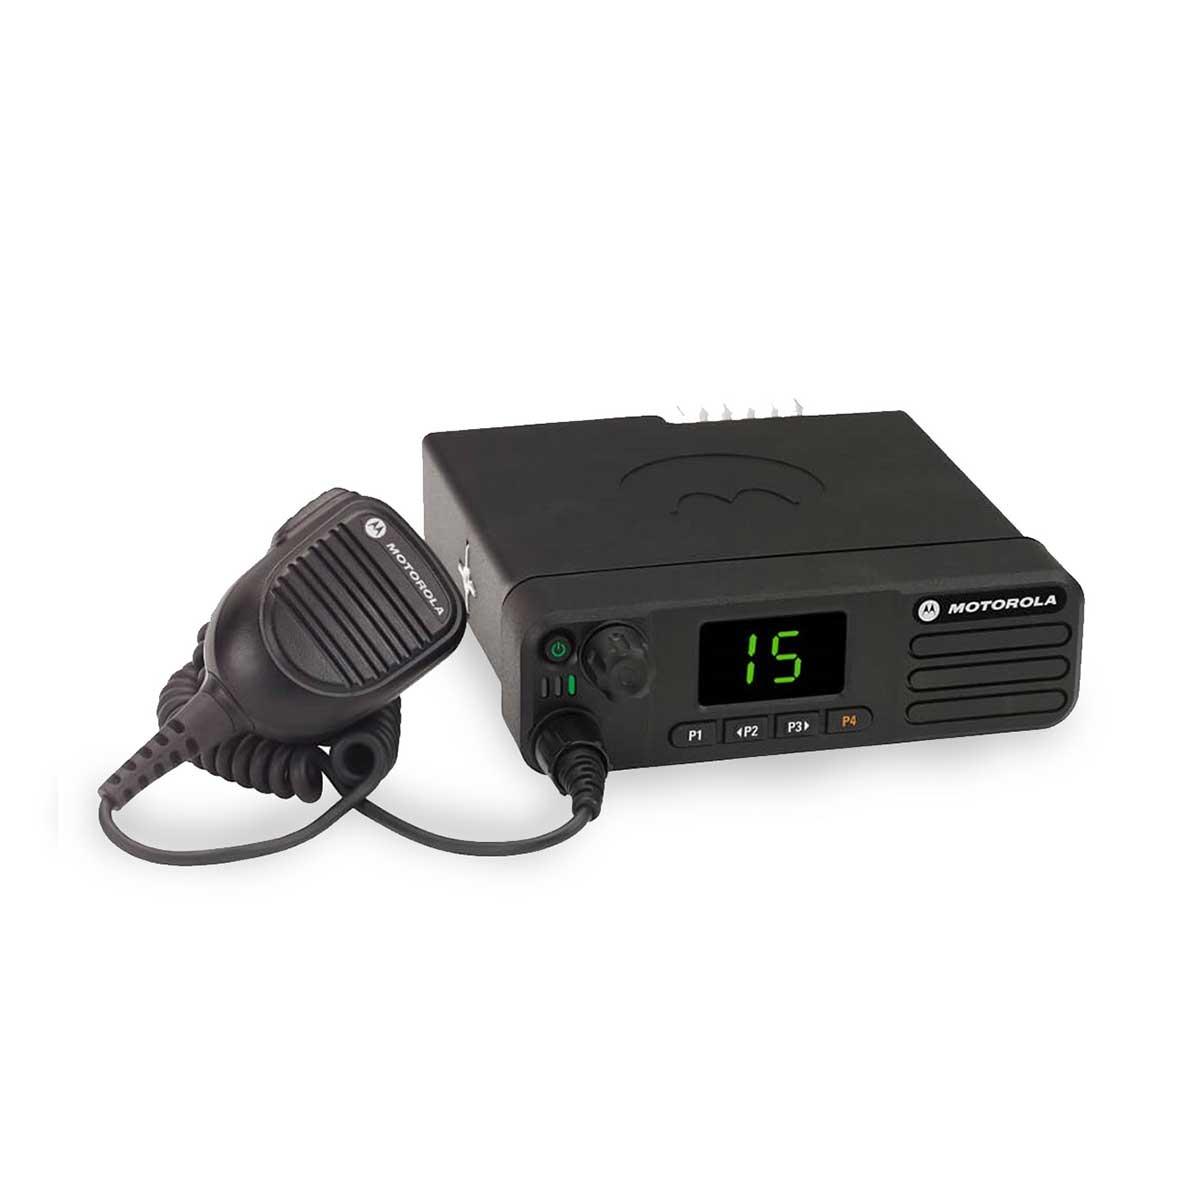 Radio Motorola DGM5000e Digital LAM28TRC9SA1AN UHF 450-527 MHZ de 40W